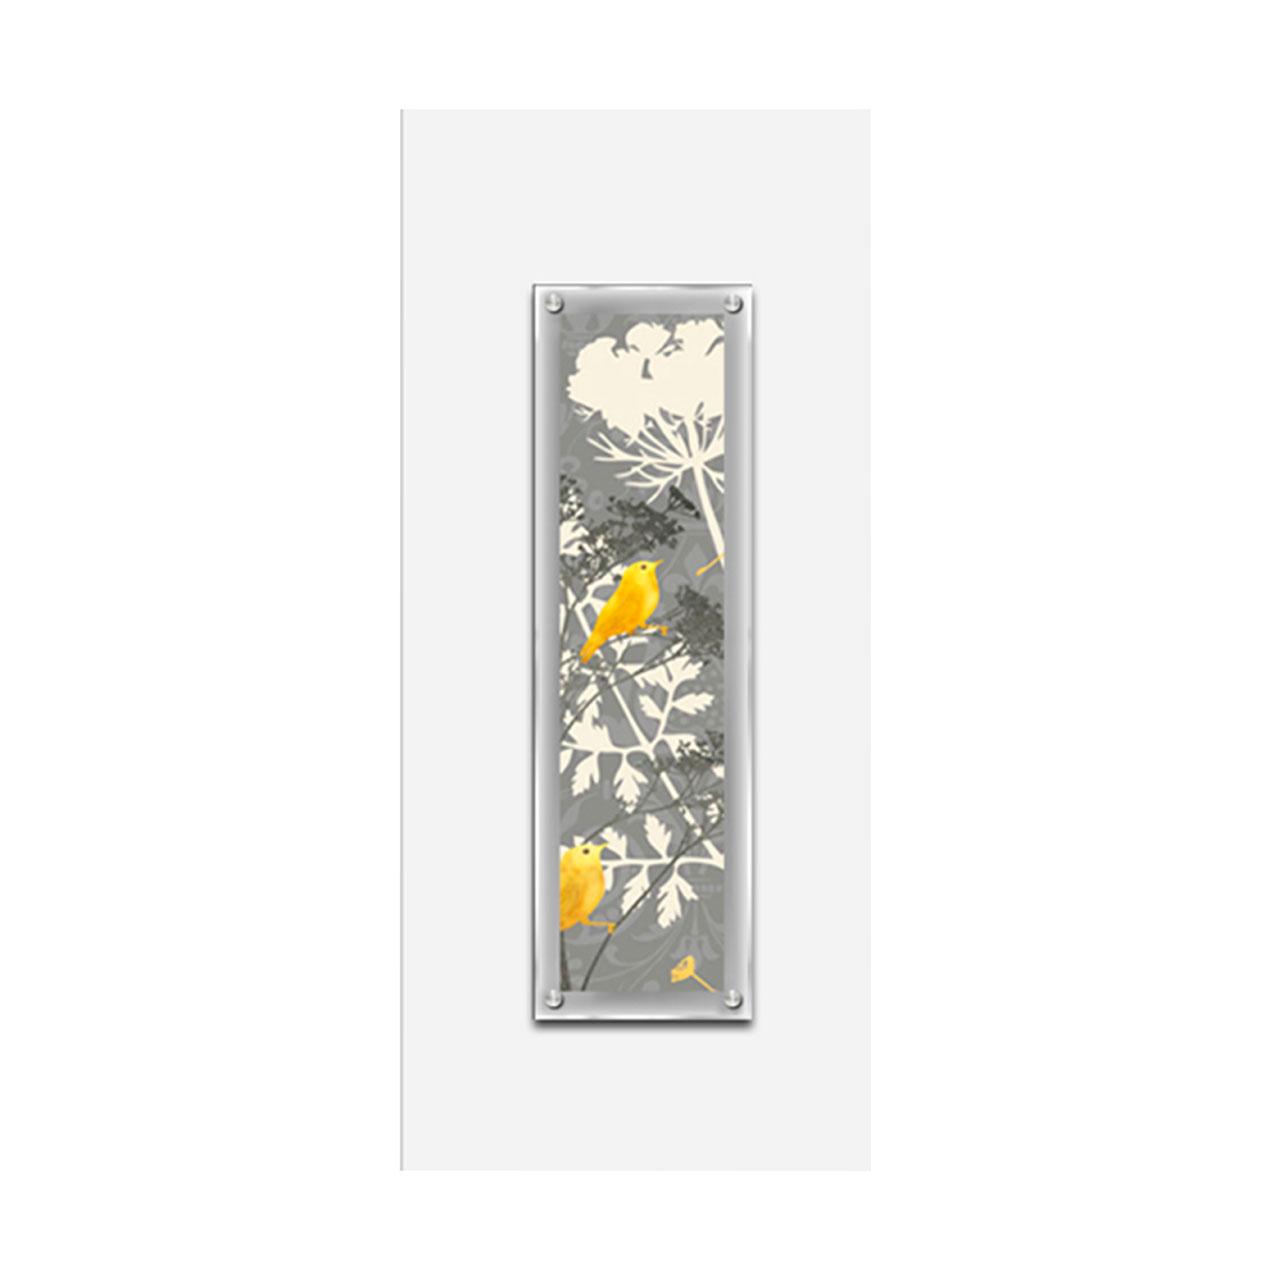 Premier 80x35cm Glass Wall Art with White Frame & Bird Print Modern ...